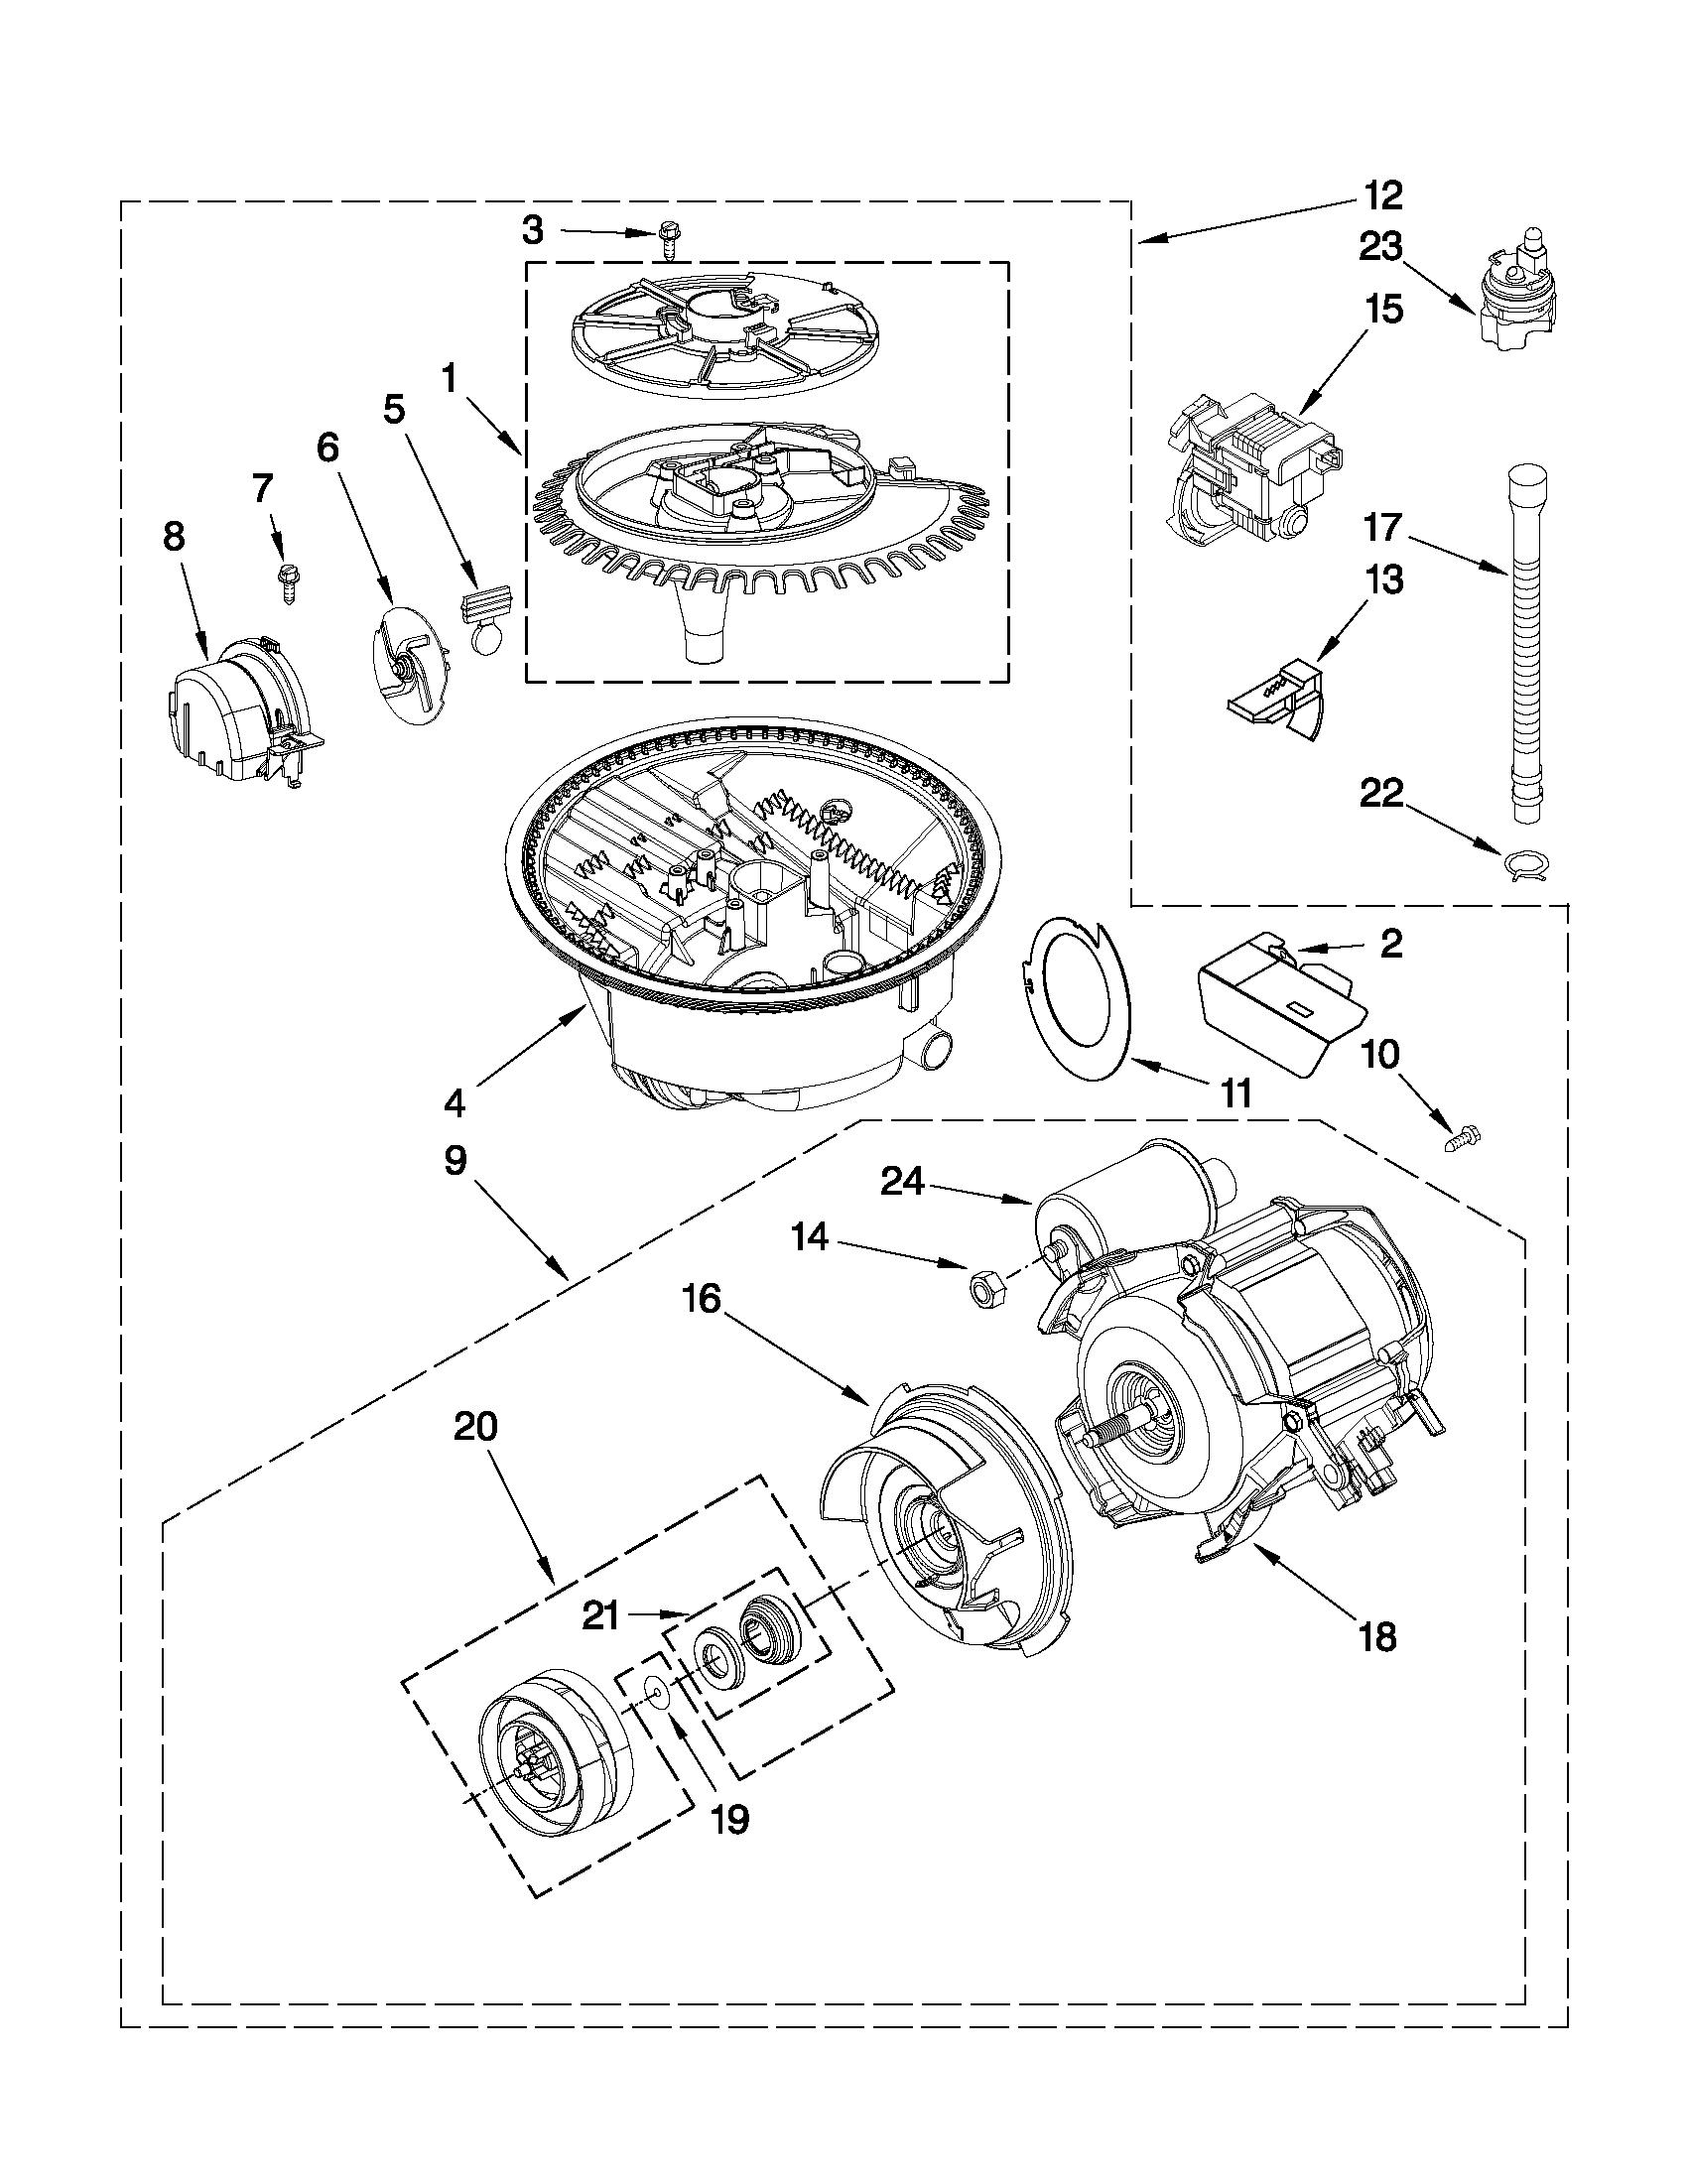 Kitchenaid model KUDS30IXSS8 dishwasher genuine parts